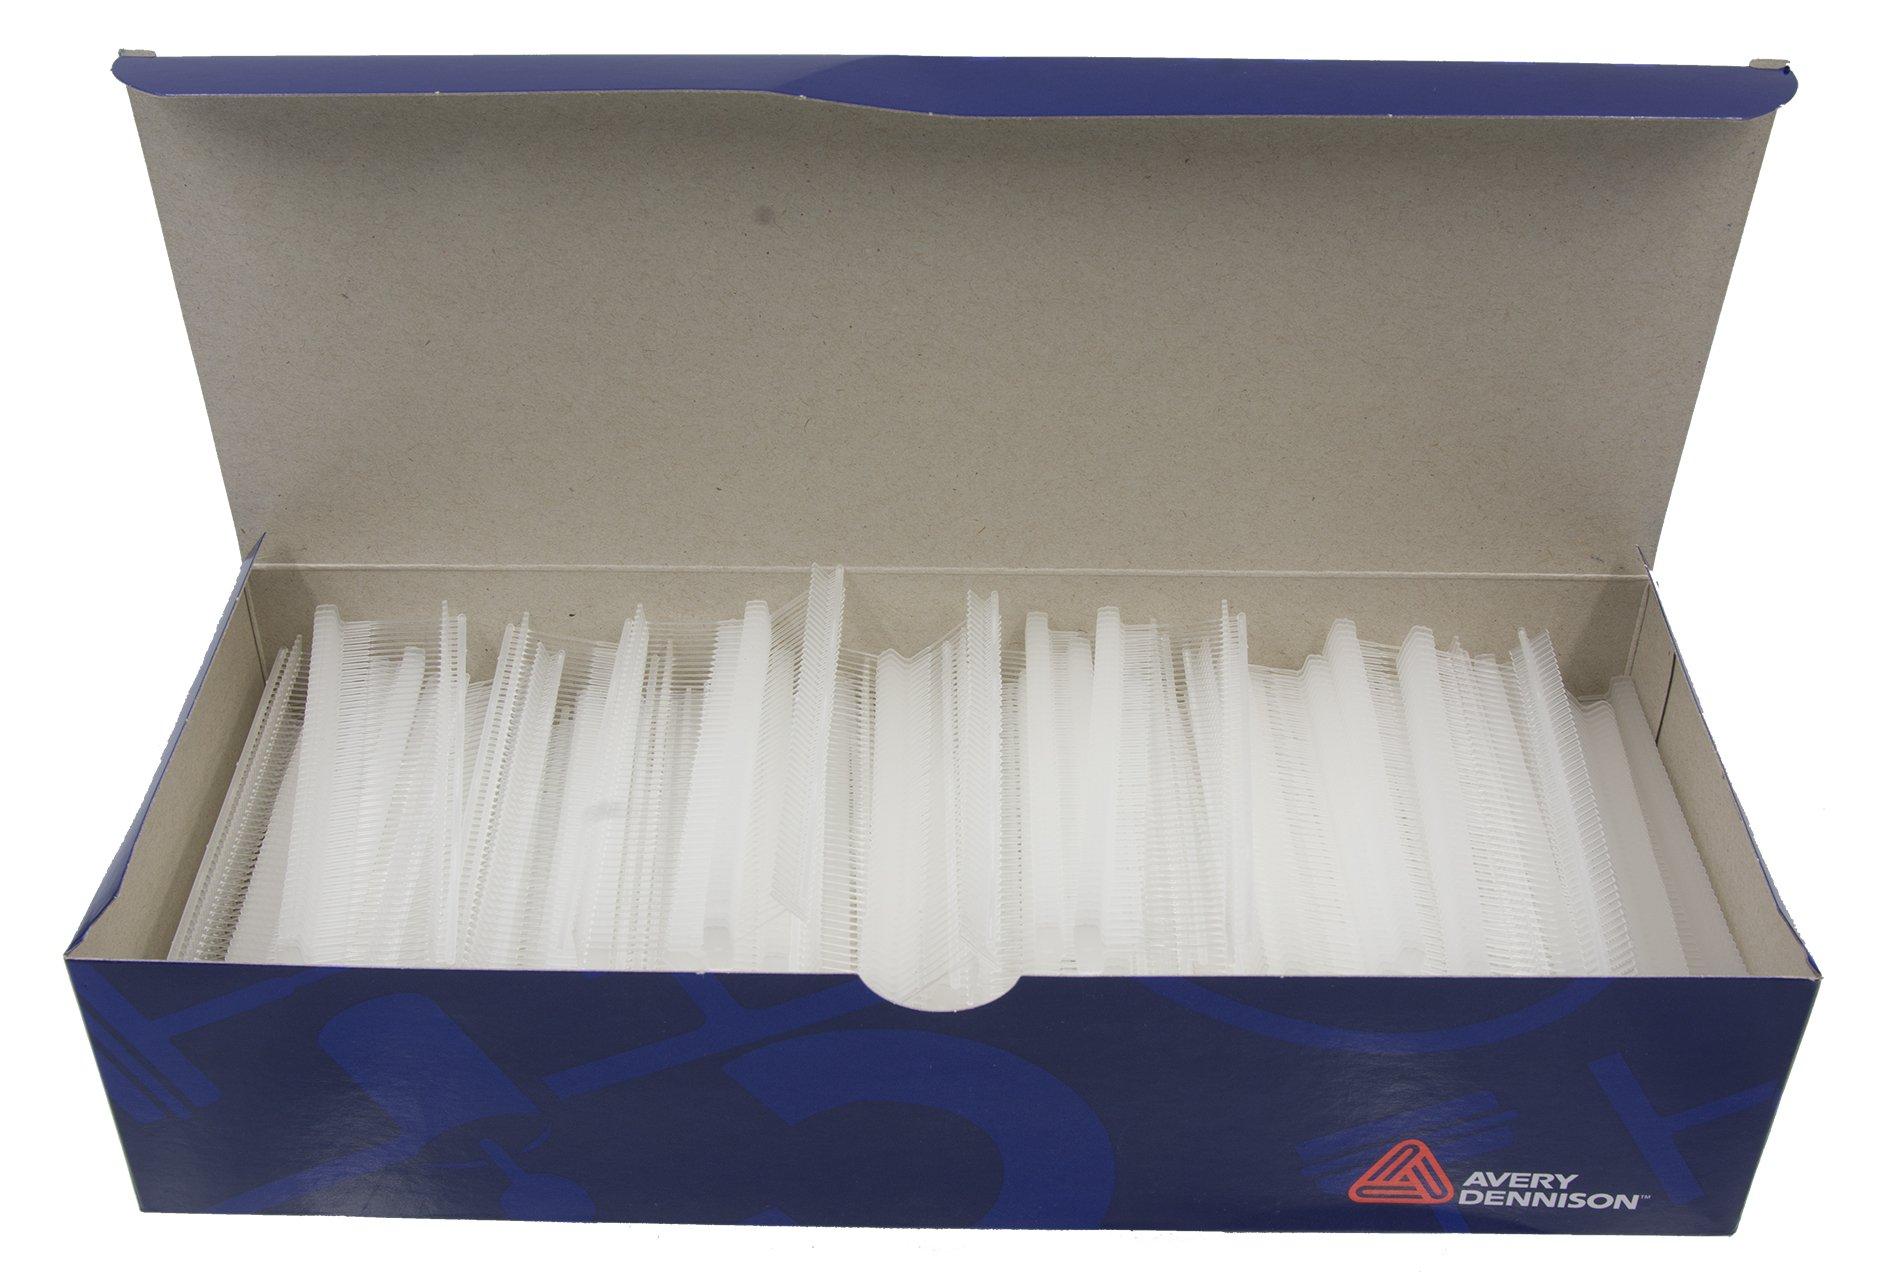 Avery Dennison 1'' Swiftach Tagging Gun Barbs / Fasteners, Box of 5,000 – Genuine Avery Dennison # 08960 by Avery Dennison (Image #2)